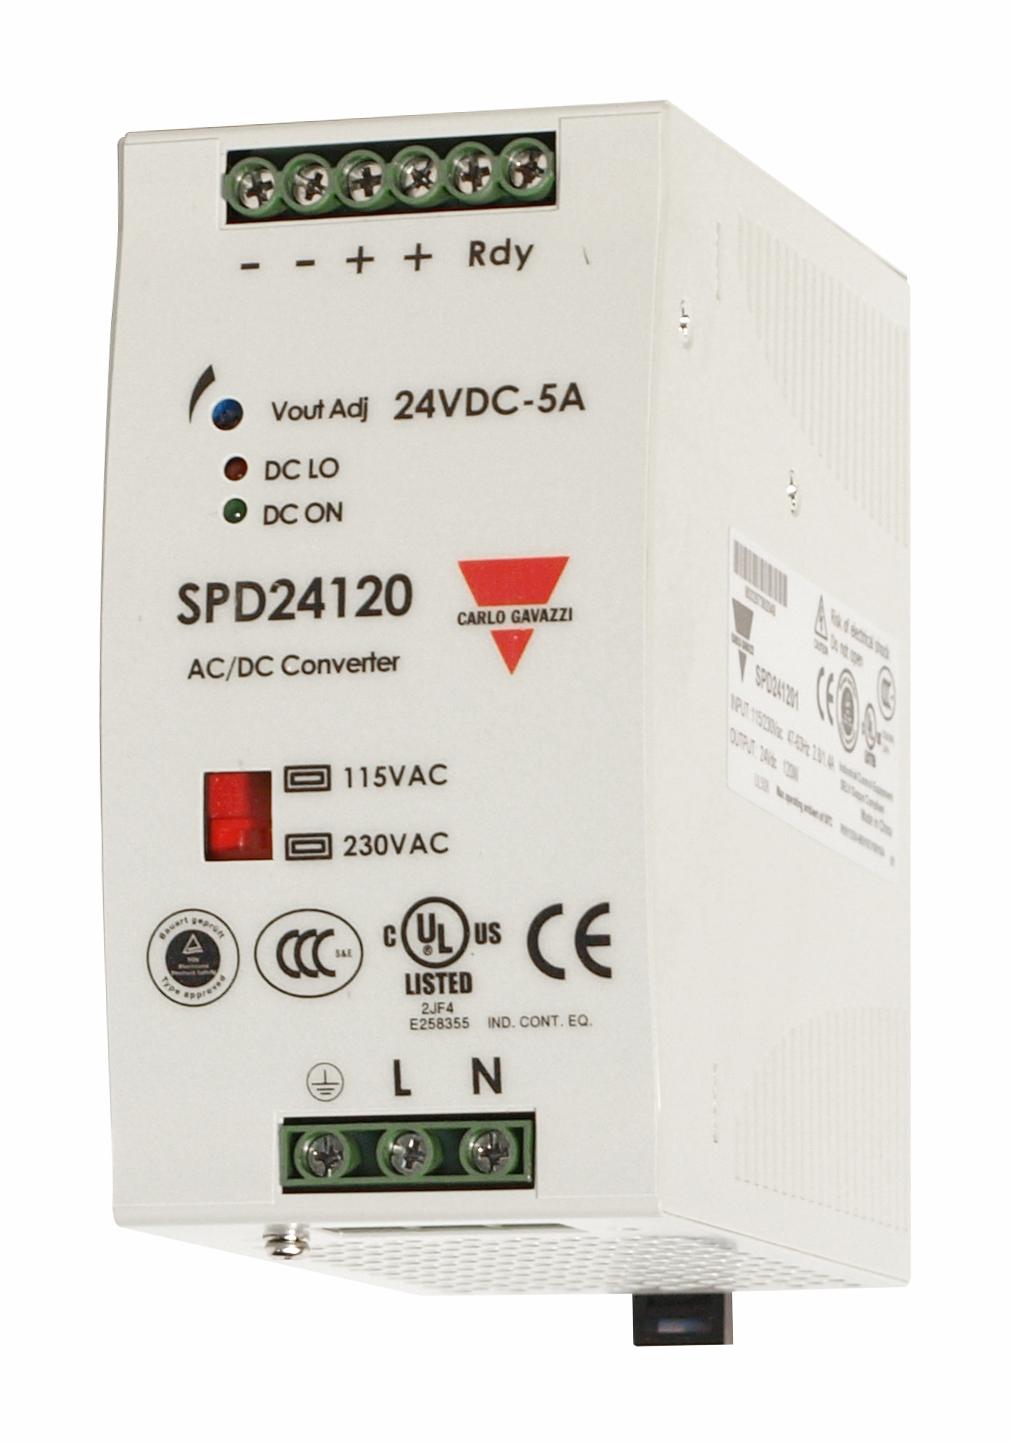 1 Stk Schaltnetzteil 24VDC 5A 120W LP749120--